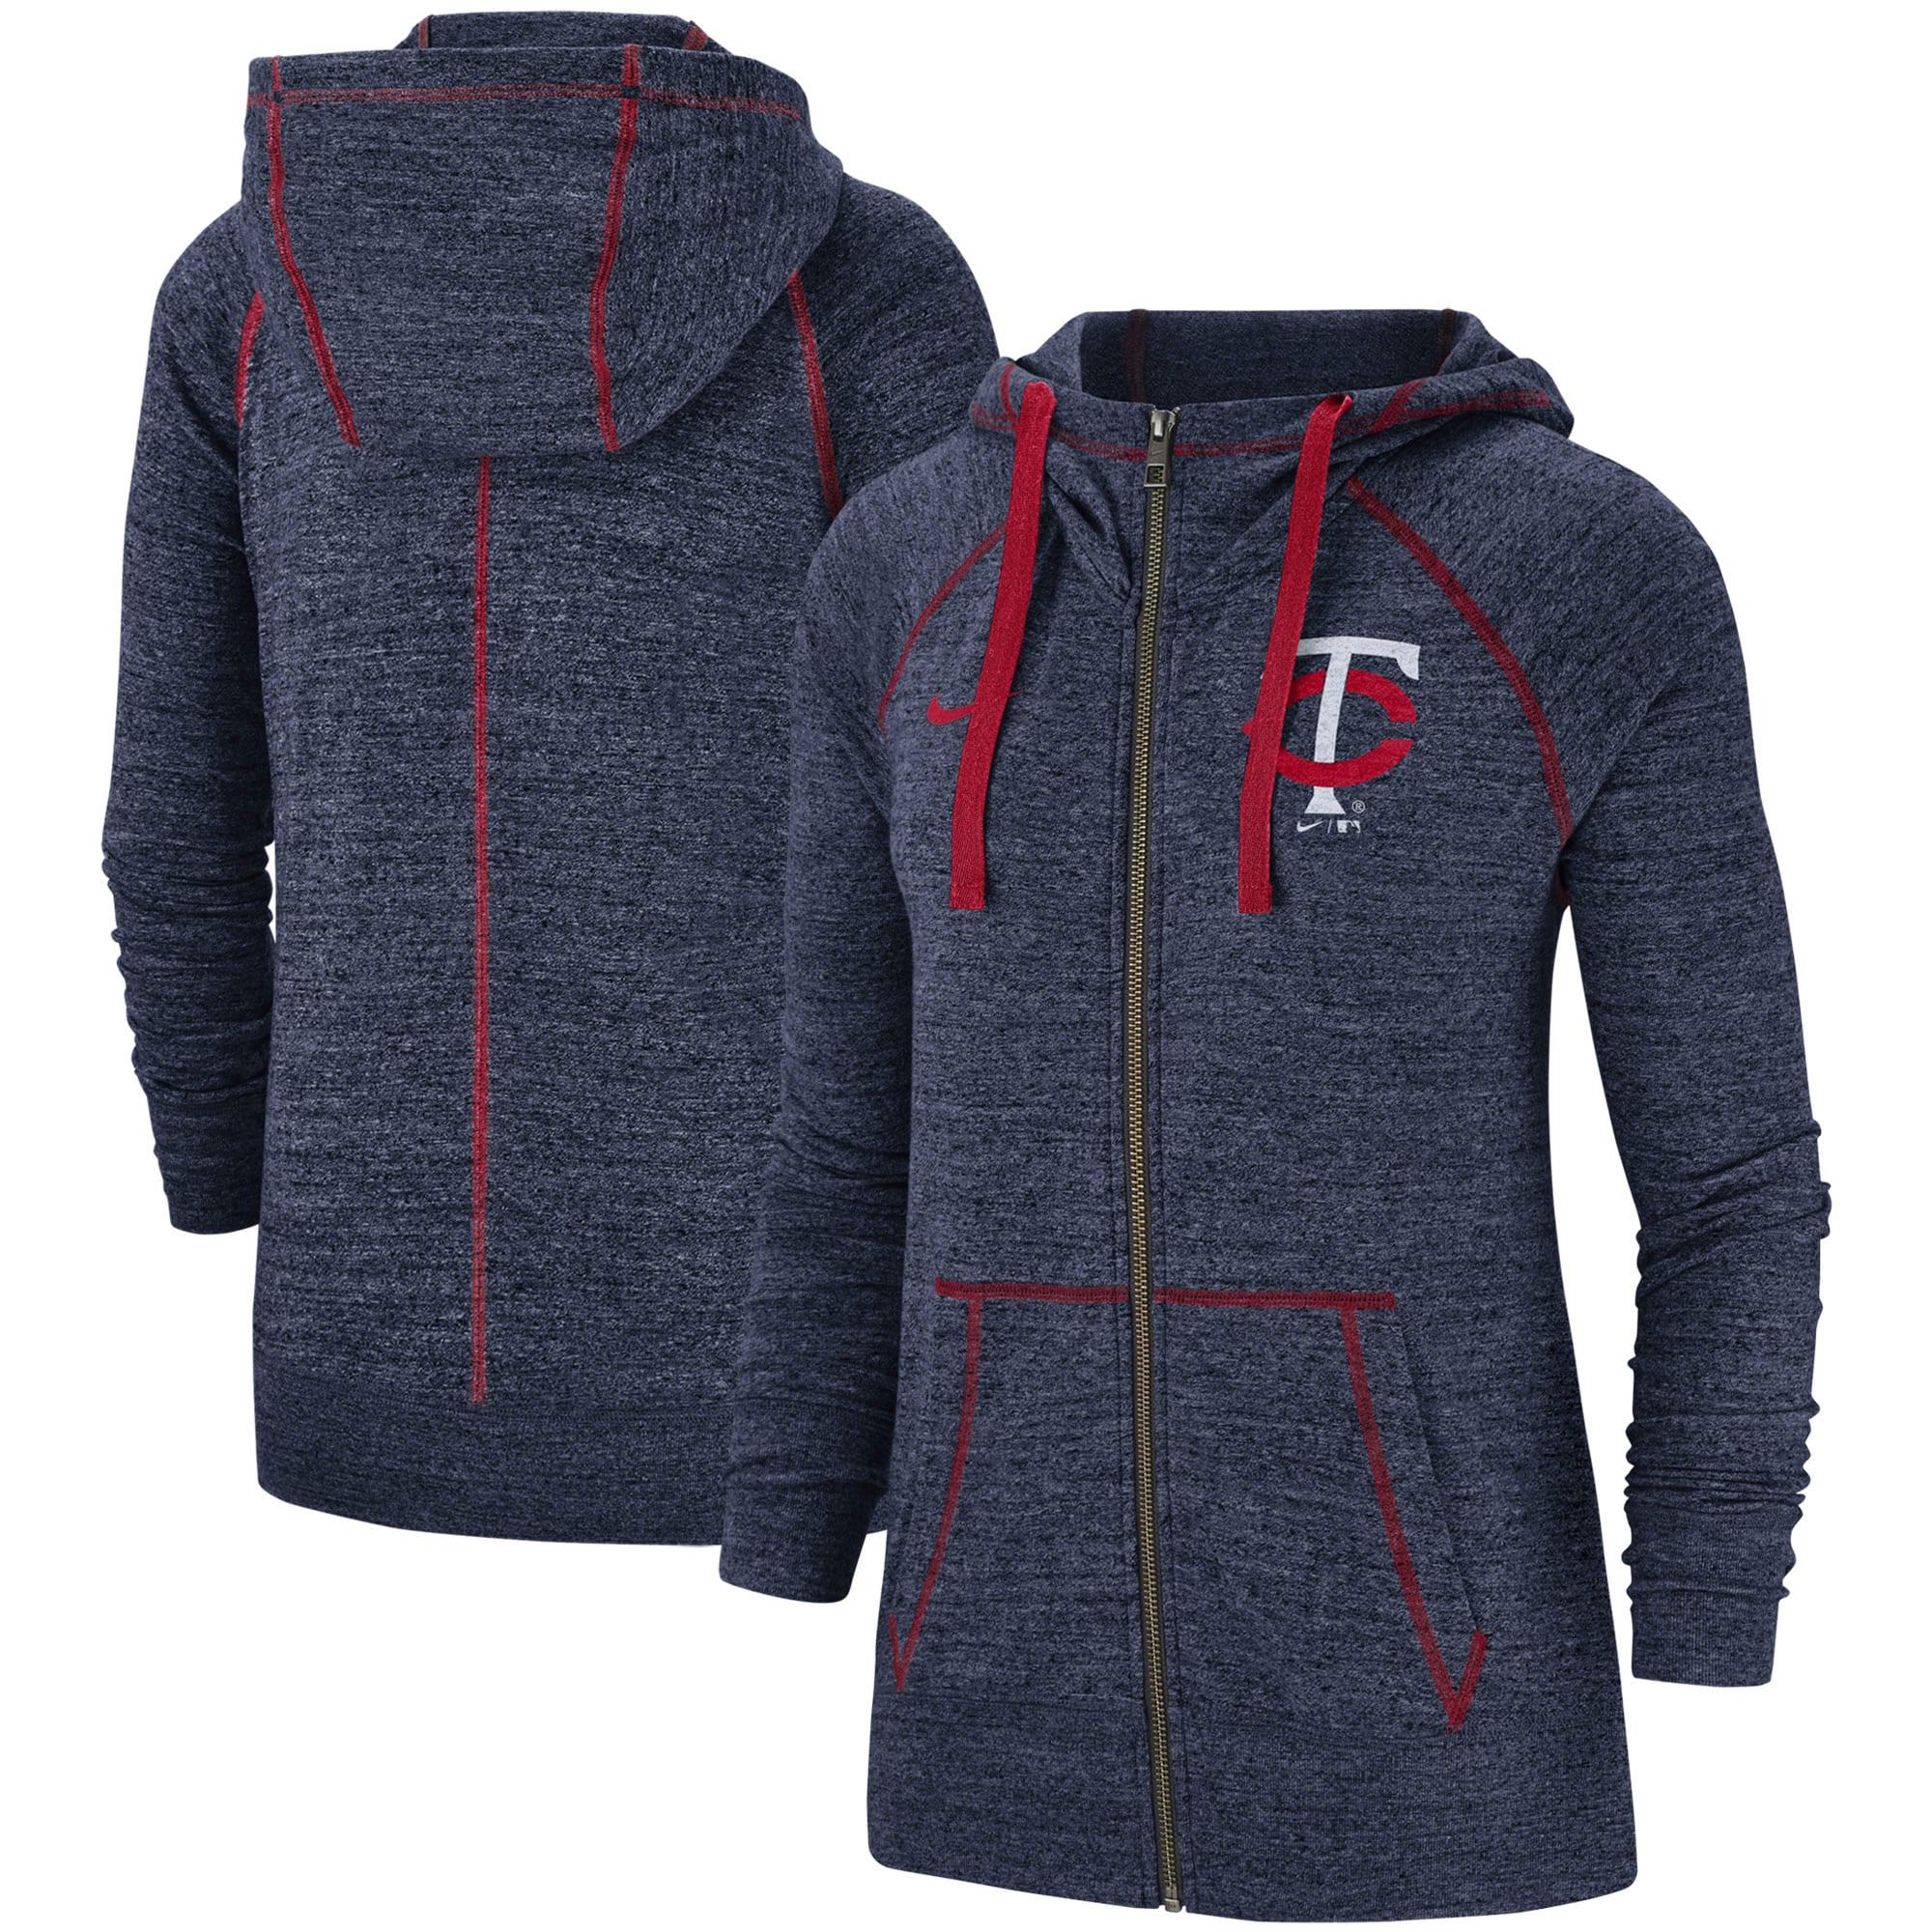 IDEOLOGY Plus Size Soft Knit Full Zip Front Heathered Hoodie Sweatshirt NWT 3X